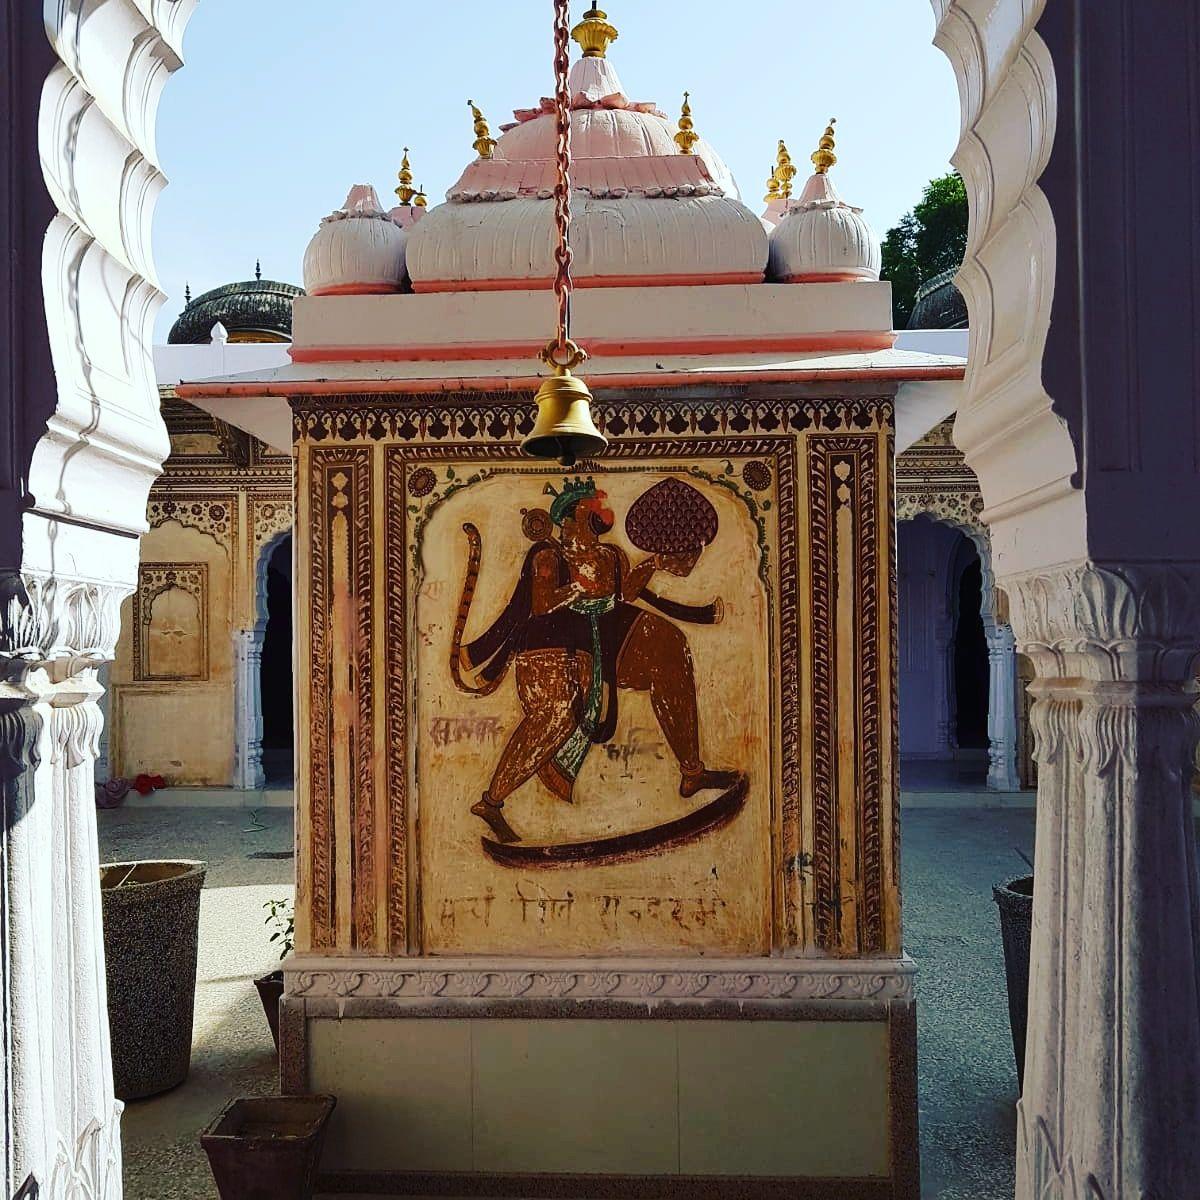 Photo of Mahansar By Vivek Rauthan